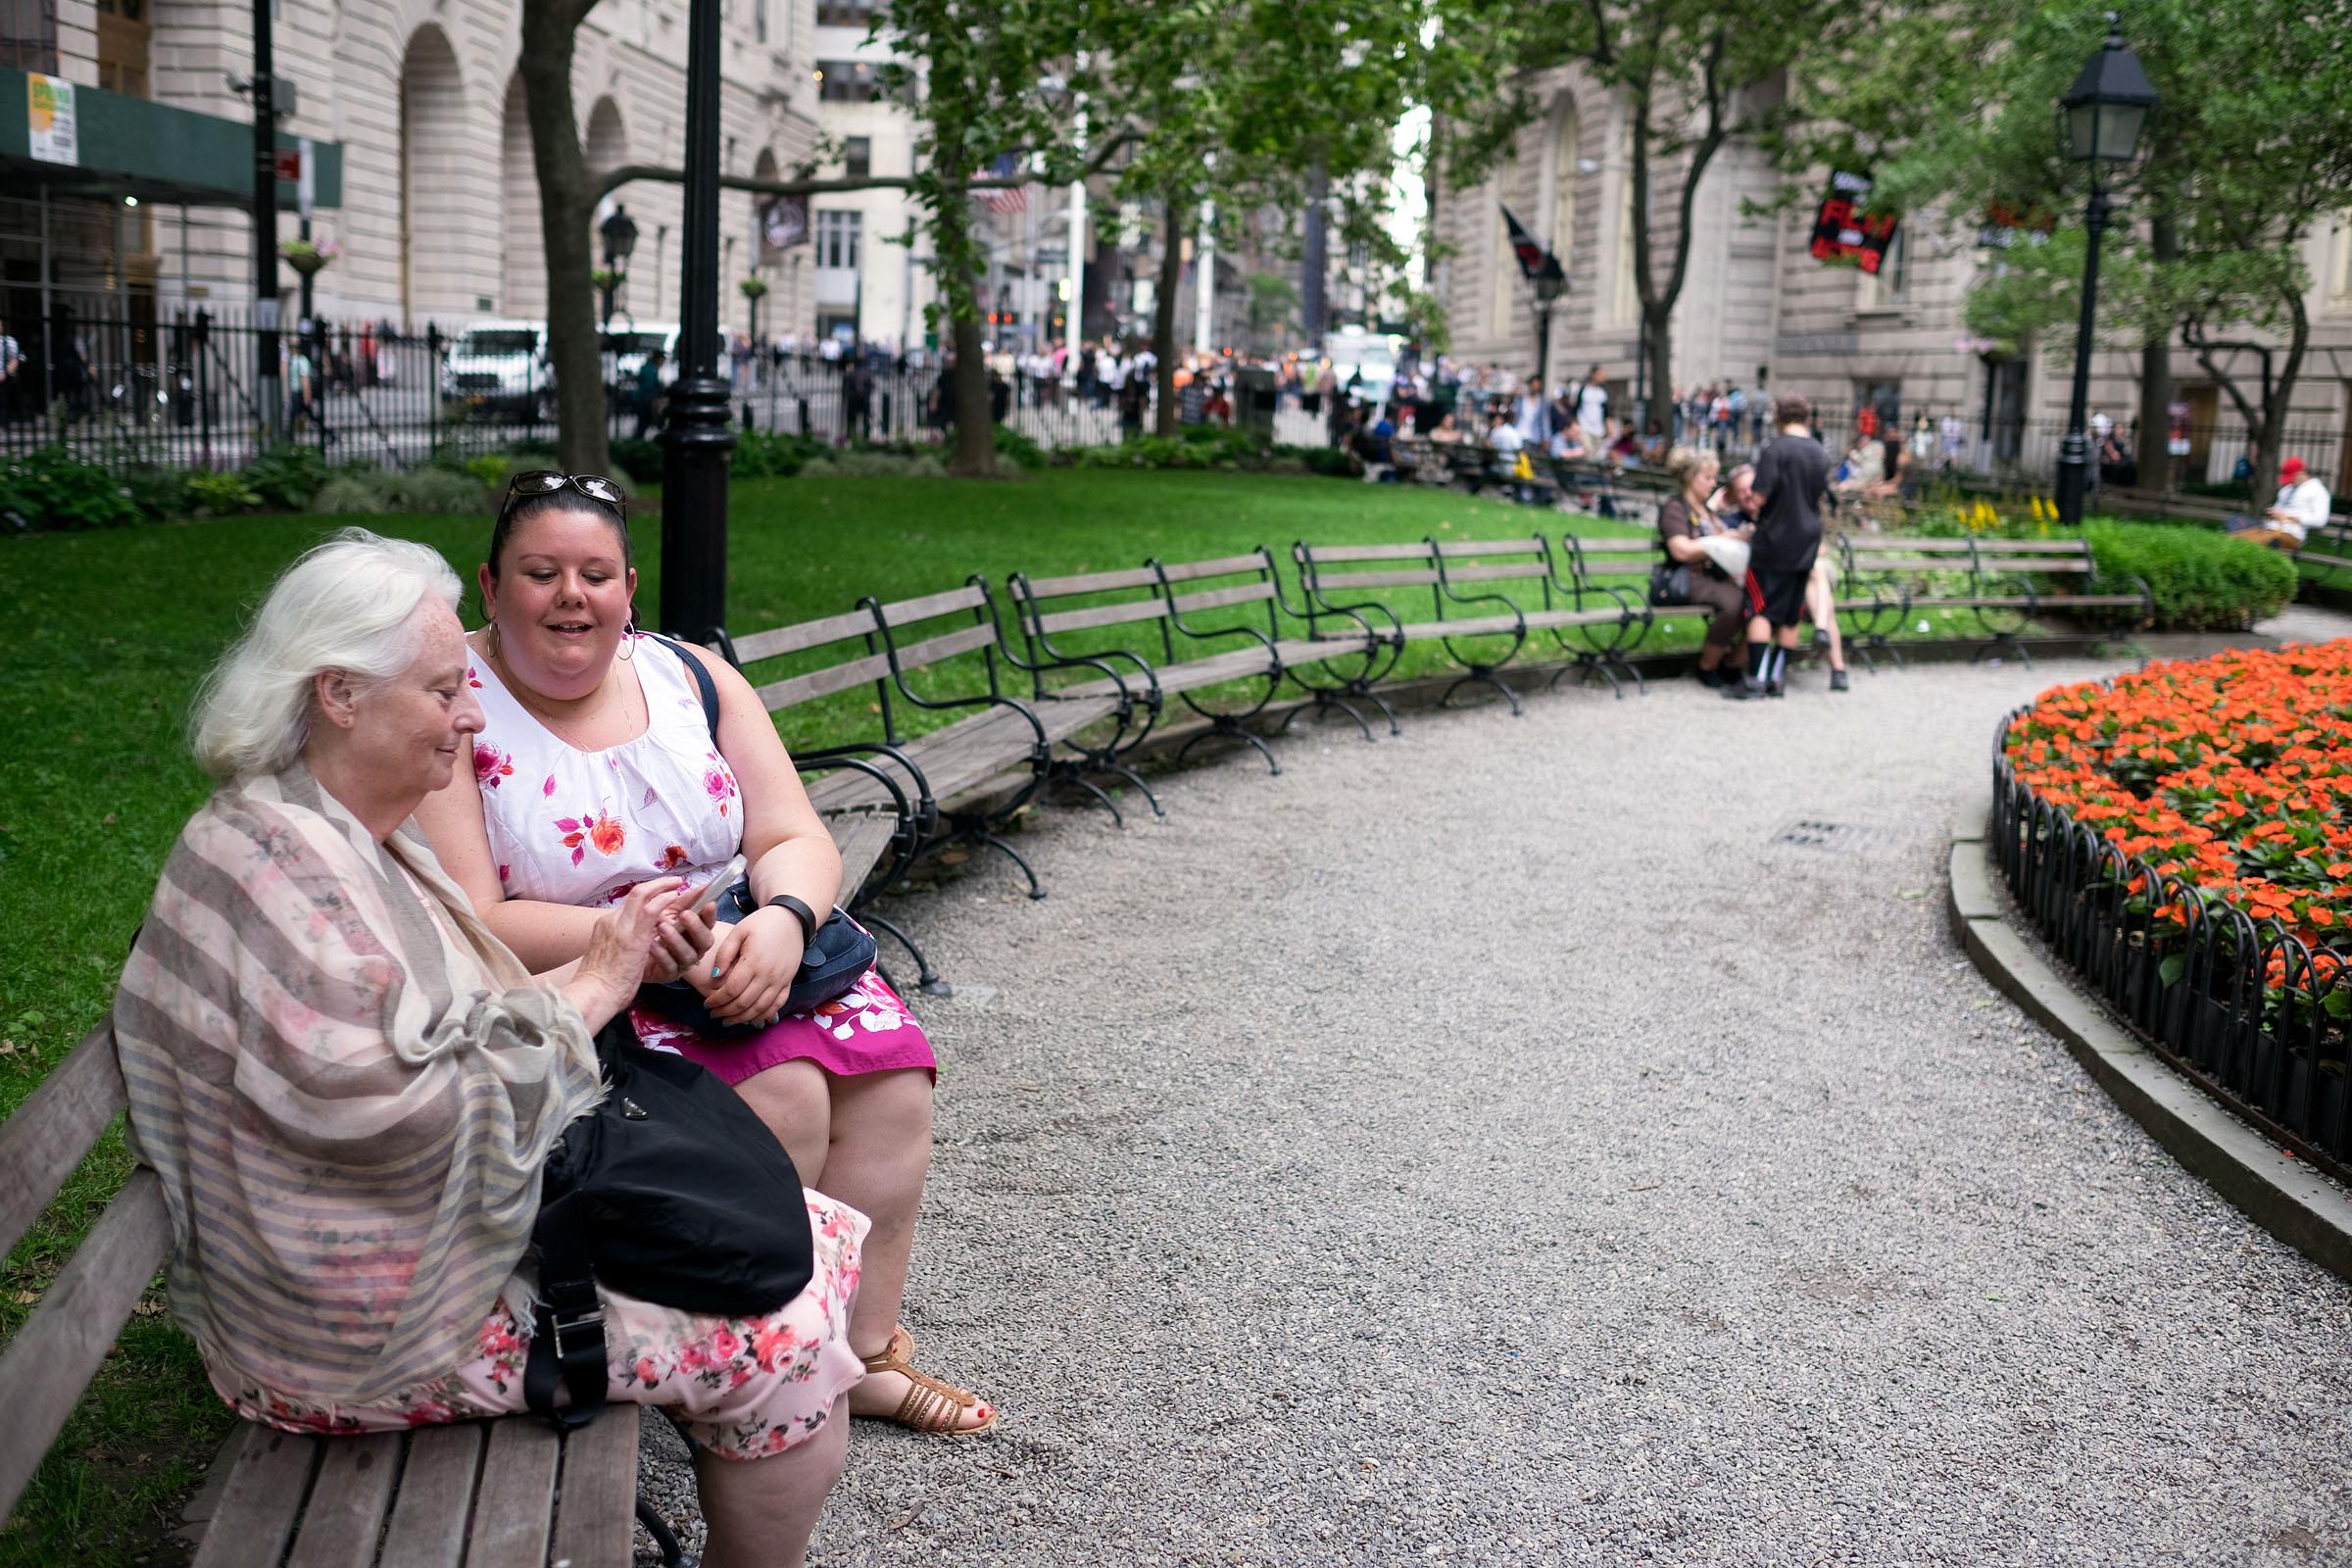 Meeting a friend after work. New York City (June 23, 2017)